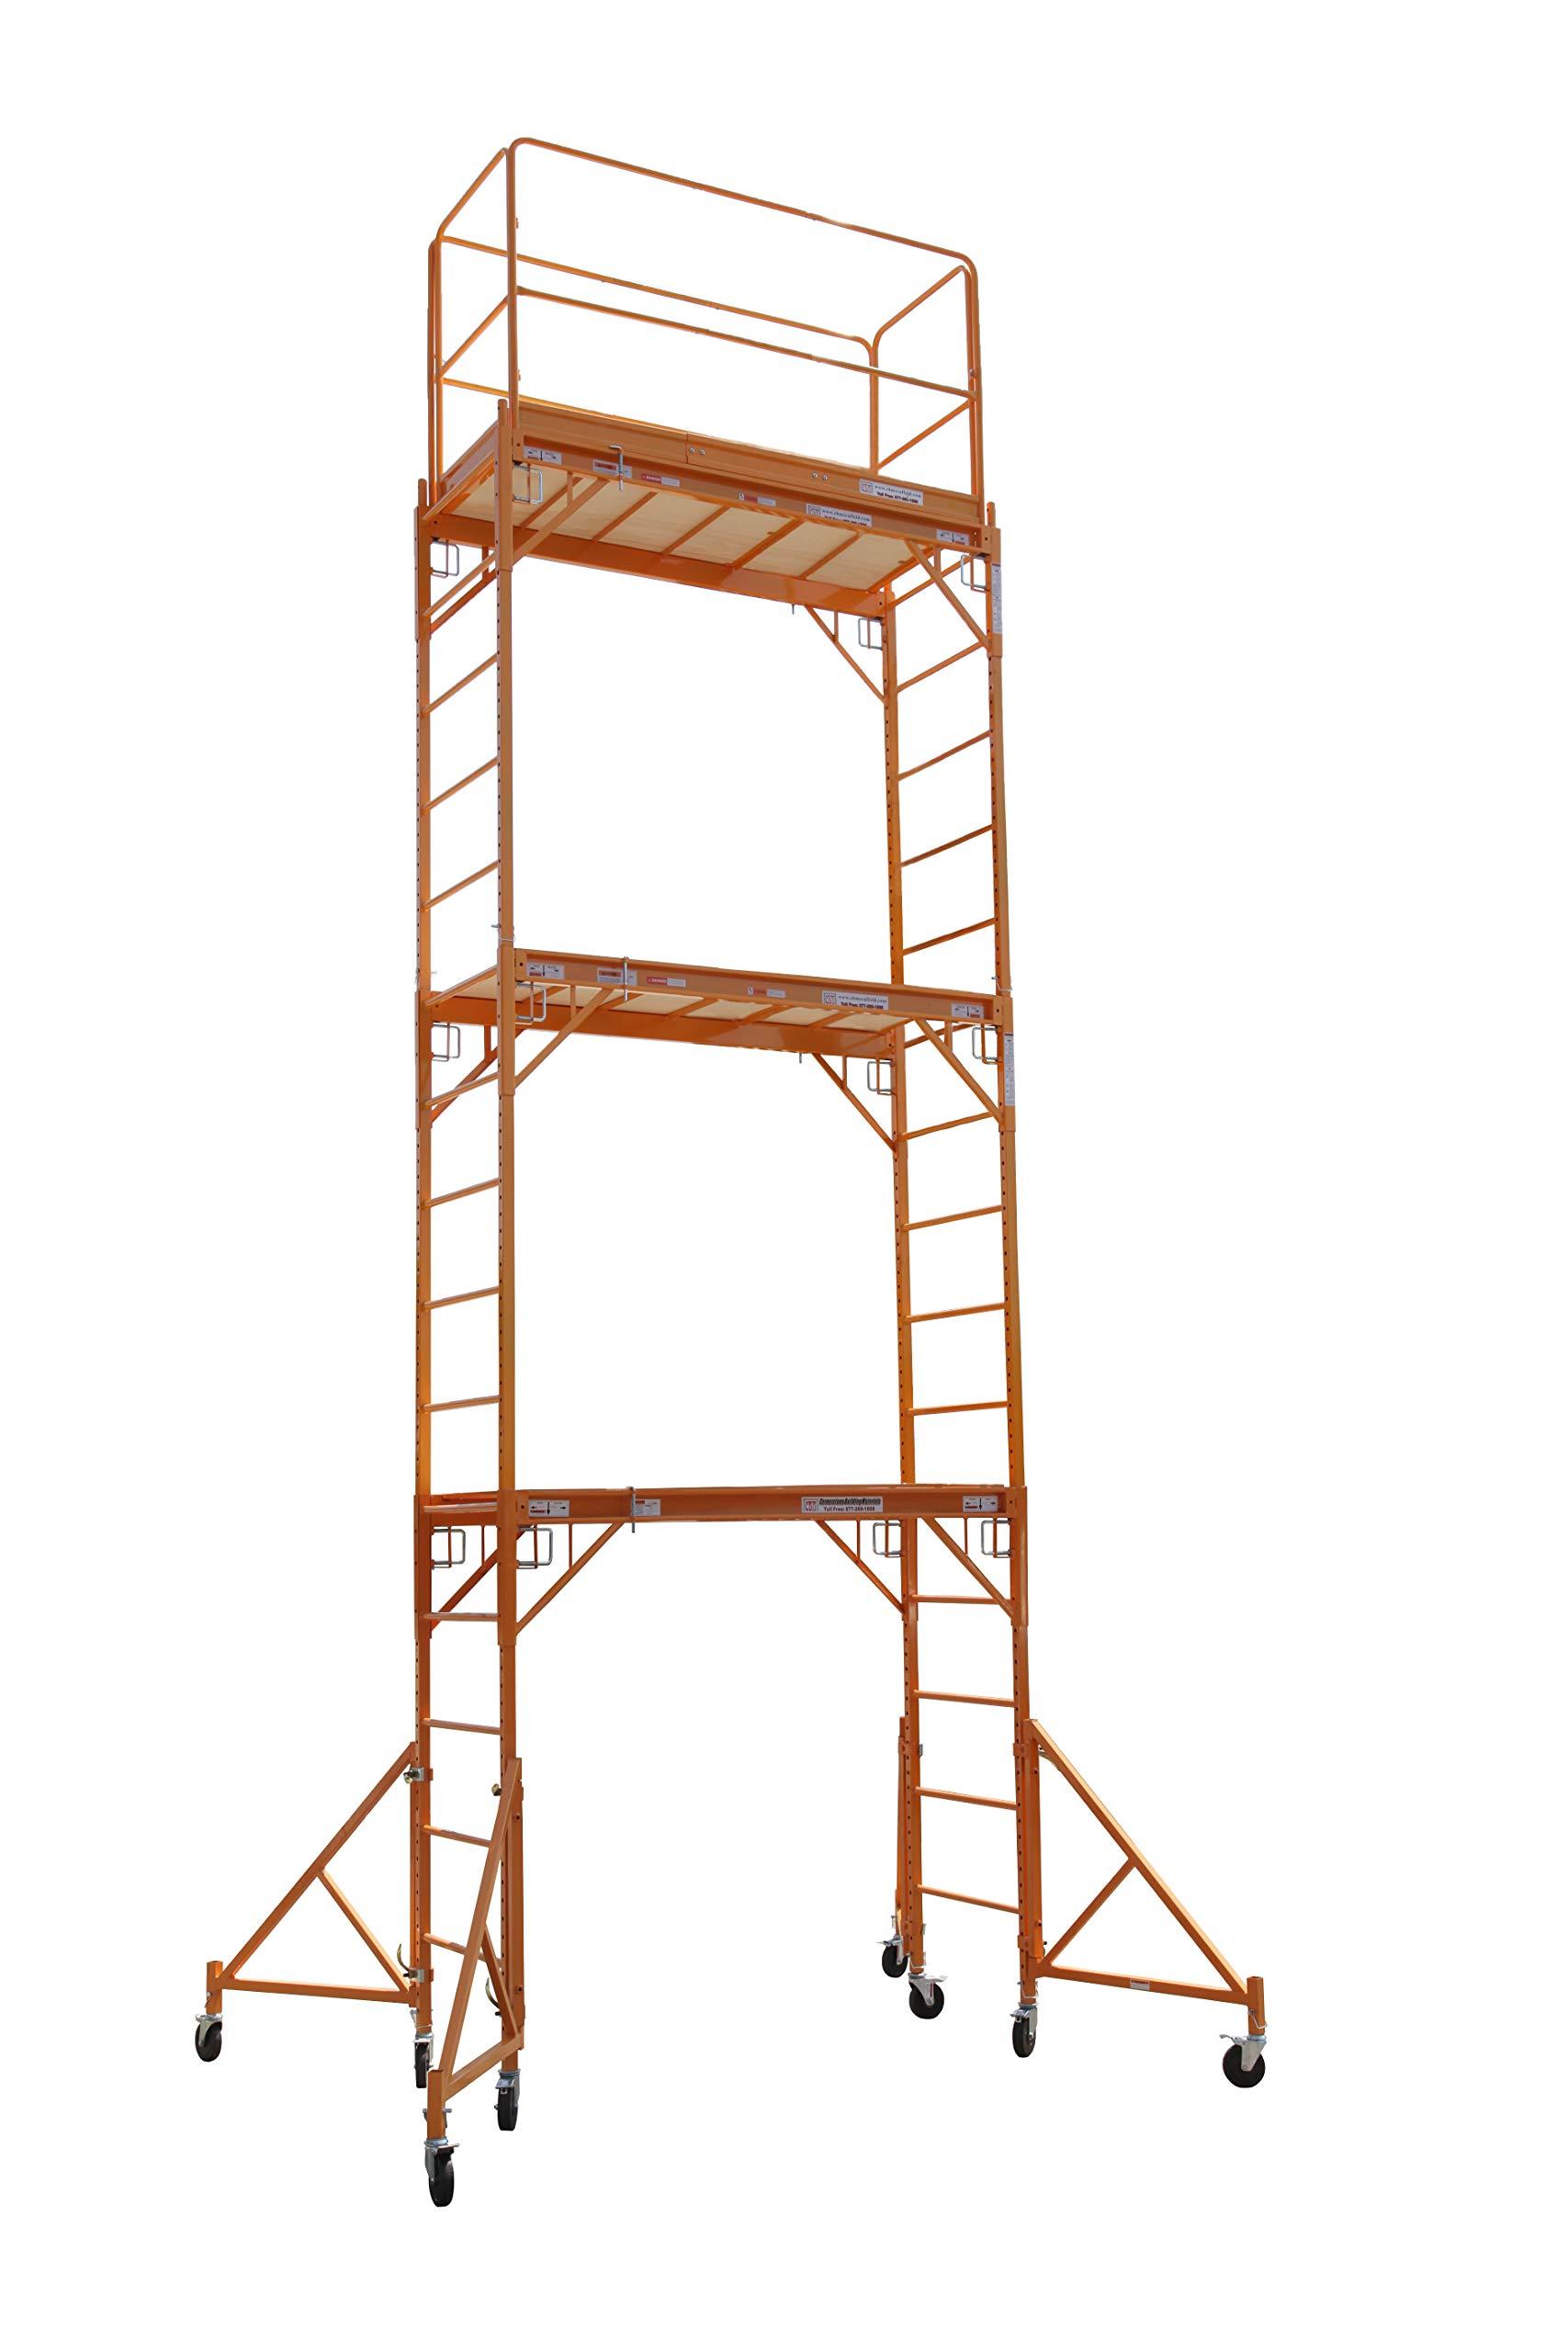 CBM Scaffold Multipurpose 18ft. Maxi Square Triple Baker-Style Scaffold Tower Package - 1,000-Lb. Capacity, Model# 3MFS